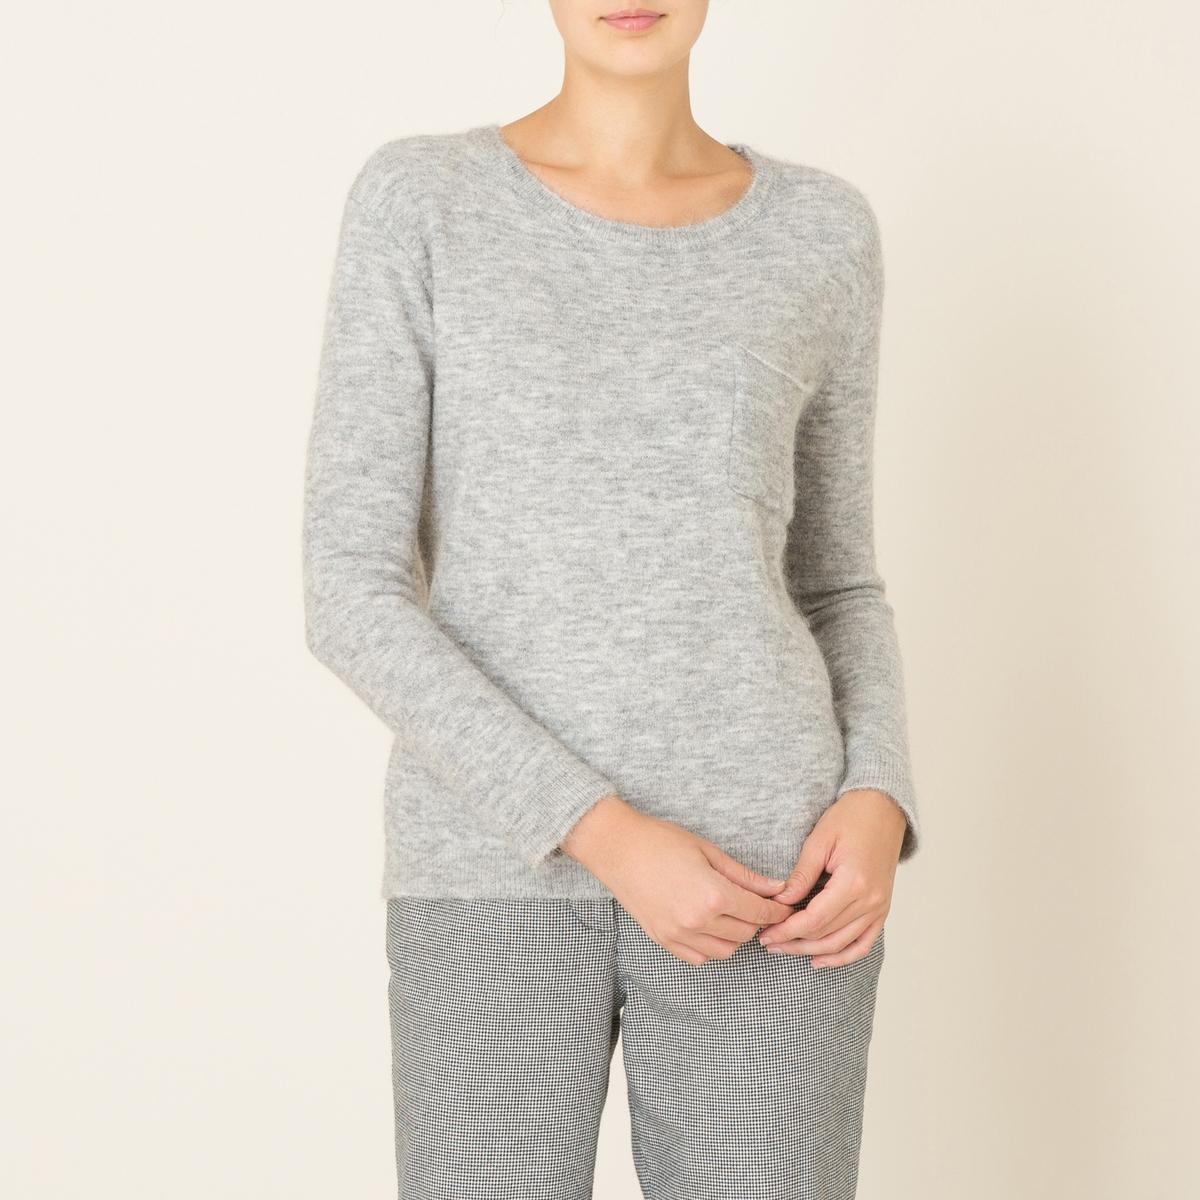 Пуловер TERAСостав и описание Материал : 42% шерсти, 42% полиамида, 14% альпаки, 2% эластана.Марка : HARRIS WILSON<br><br>Цвет: серый